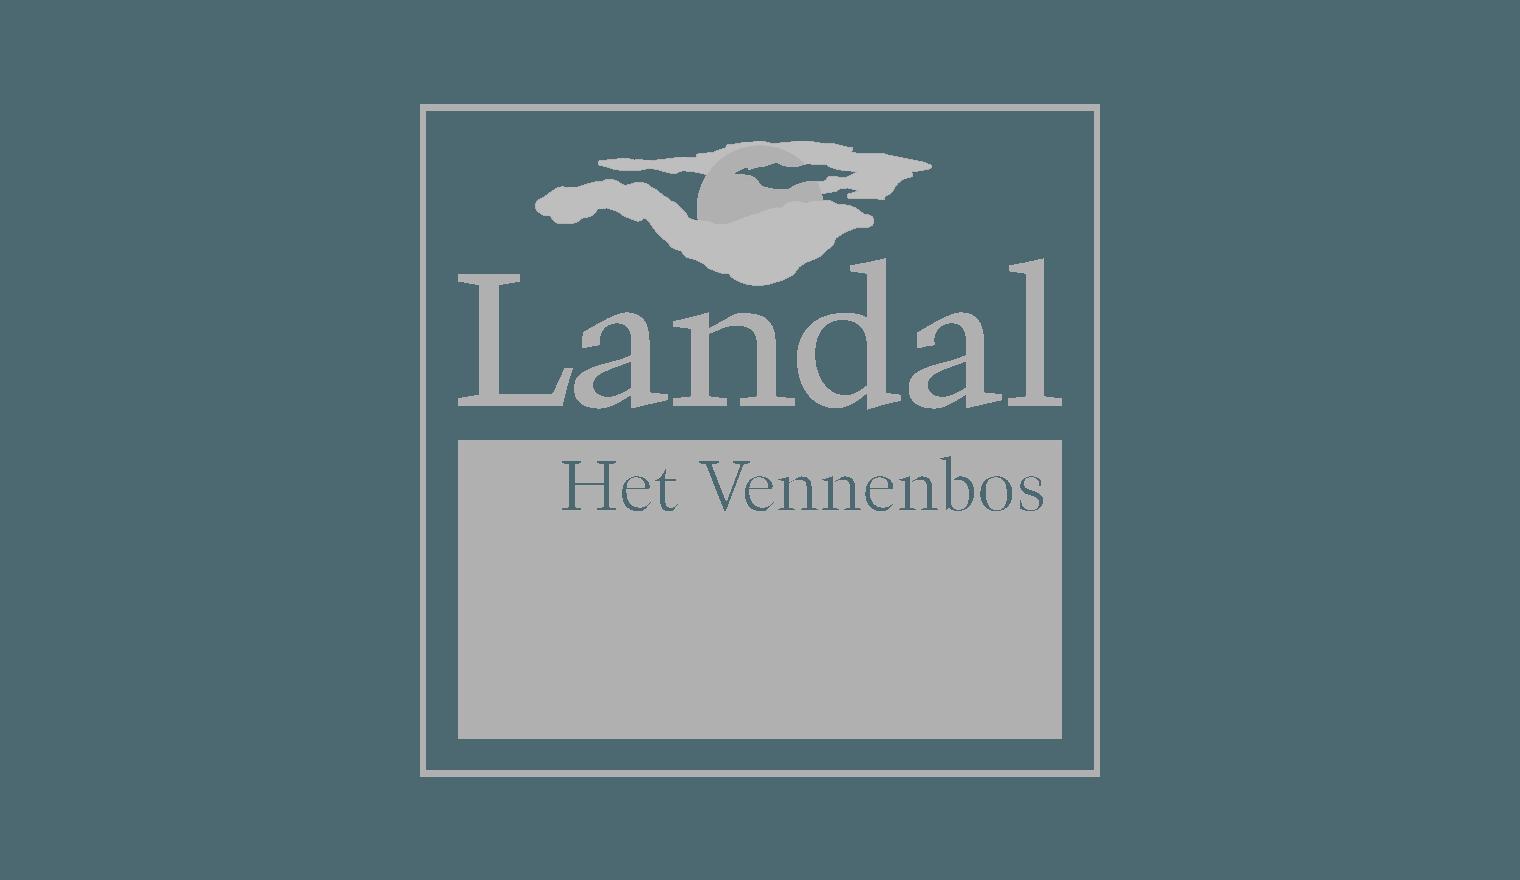 Questo Landal klant